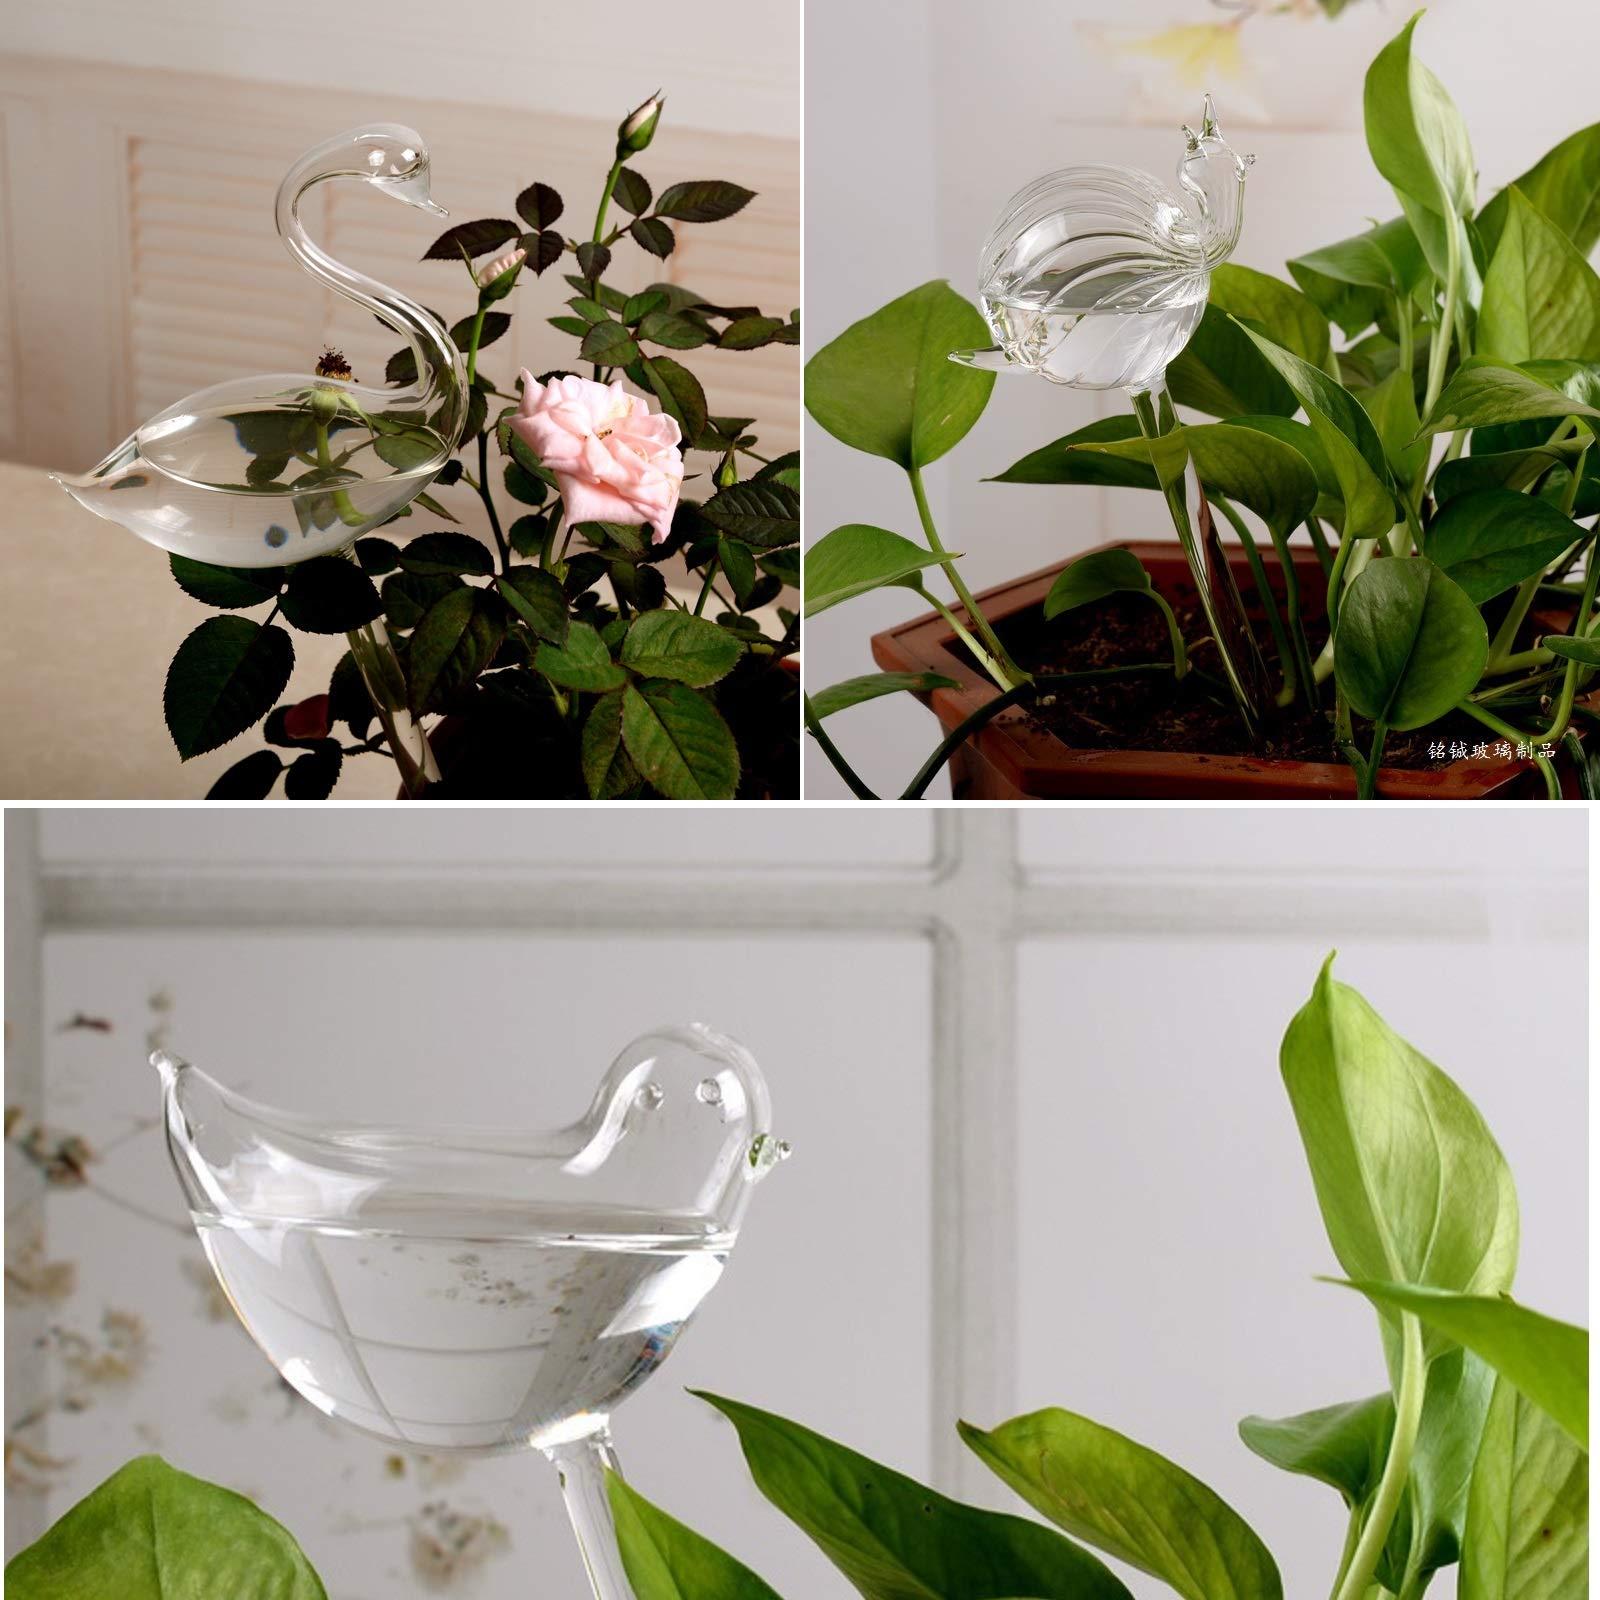 Asvert Self Watering Aqua Globes Hand-blown Mini Glass Automatic Plant Waterer, Bulbs, Bird Swan Snails Shape Decorative Design,Set of 3 by Asvert